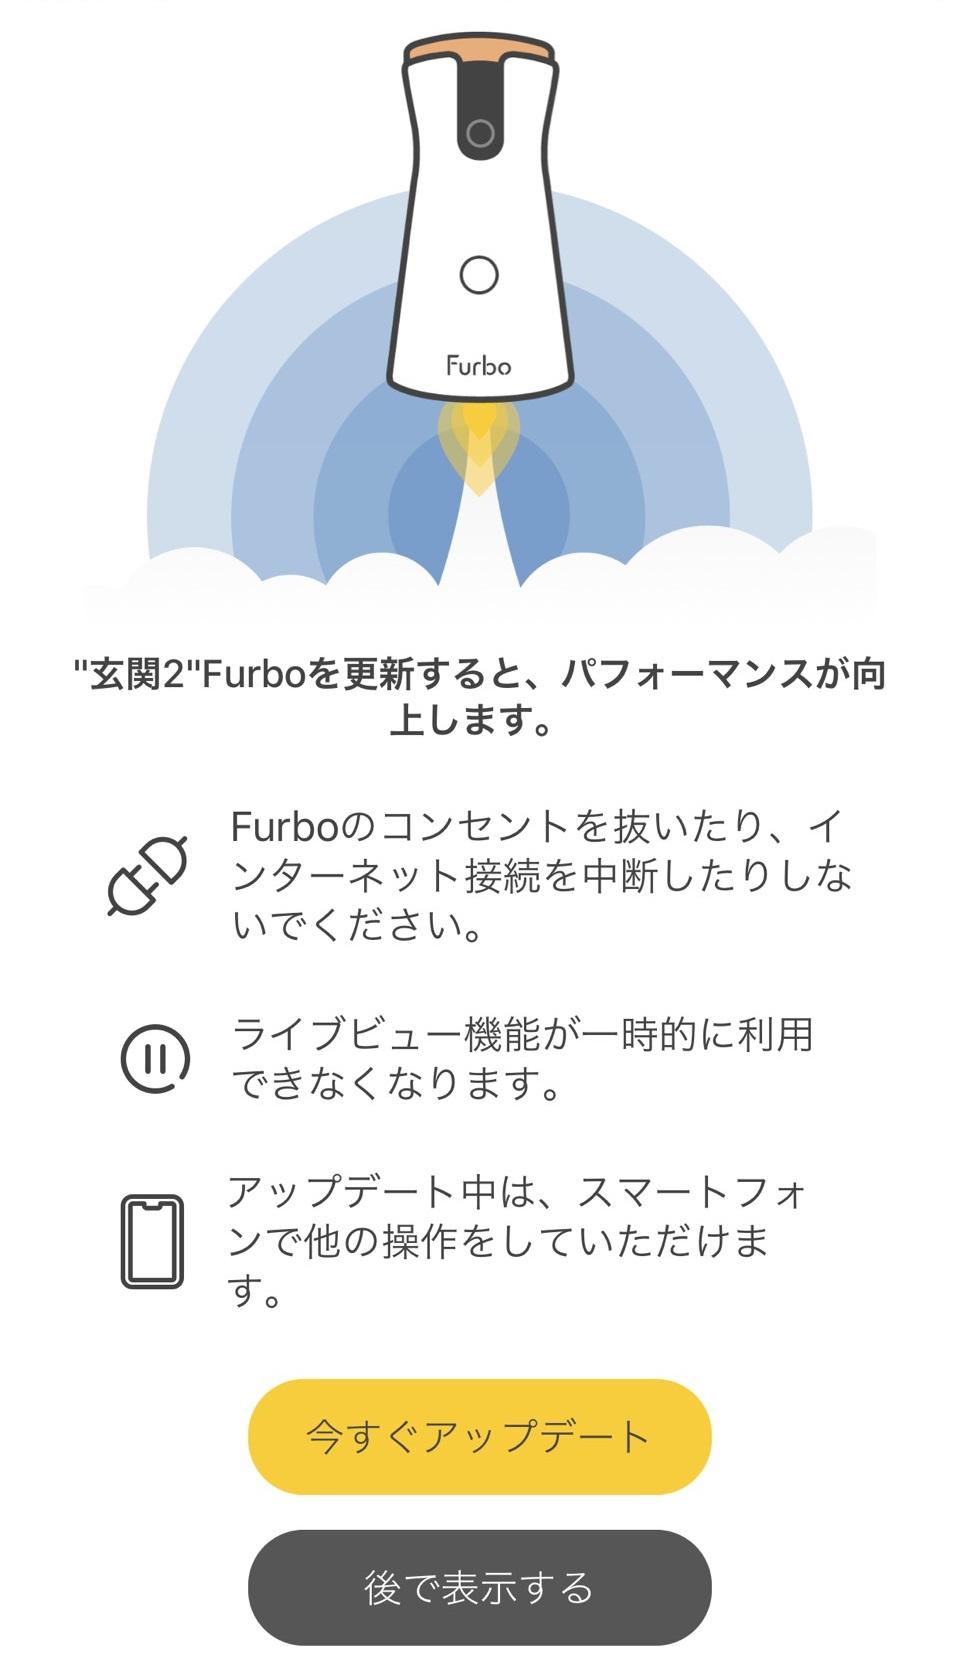 FW_UPD1.jpg